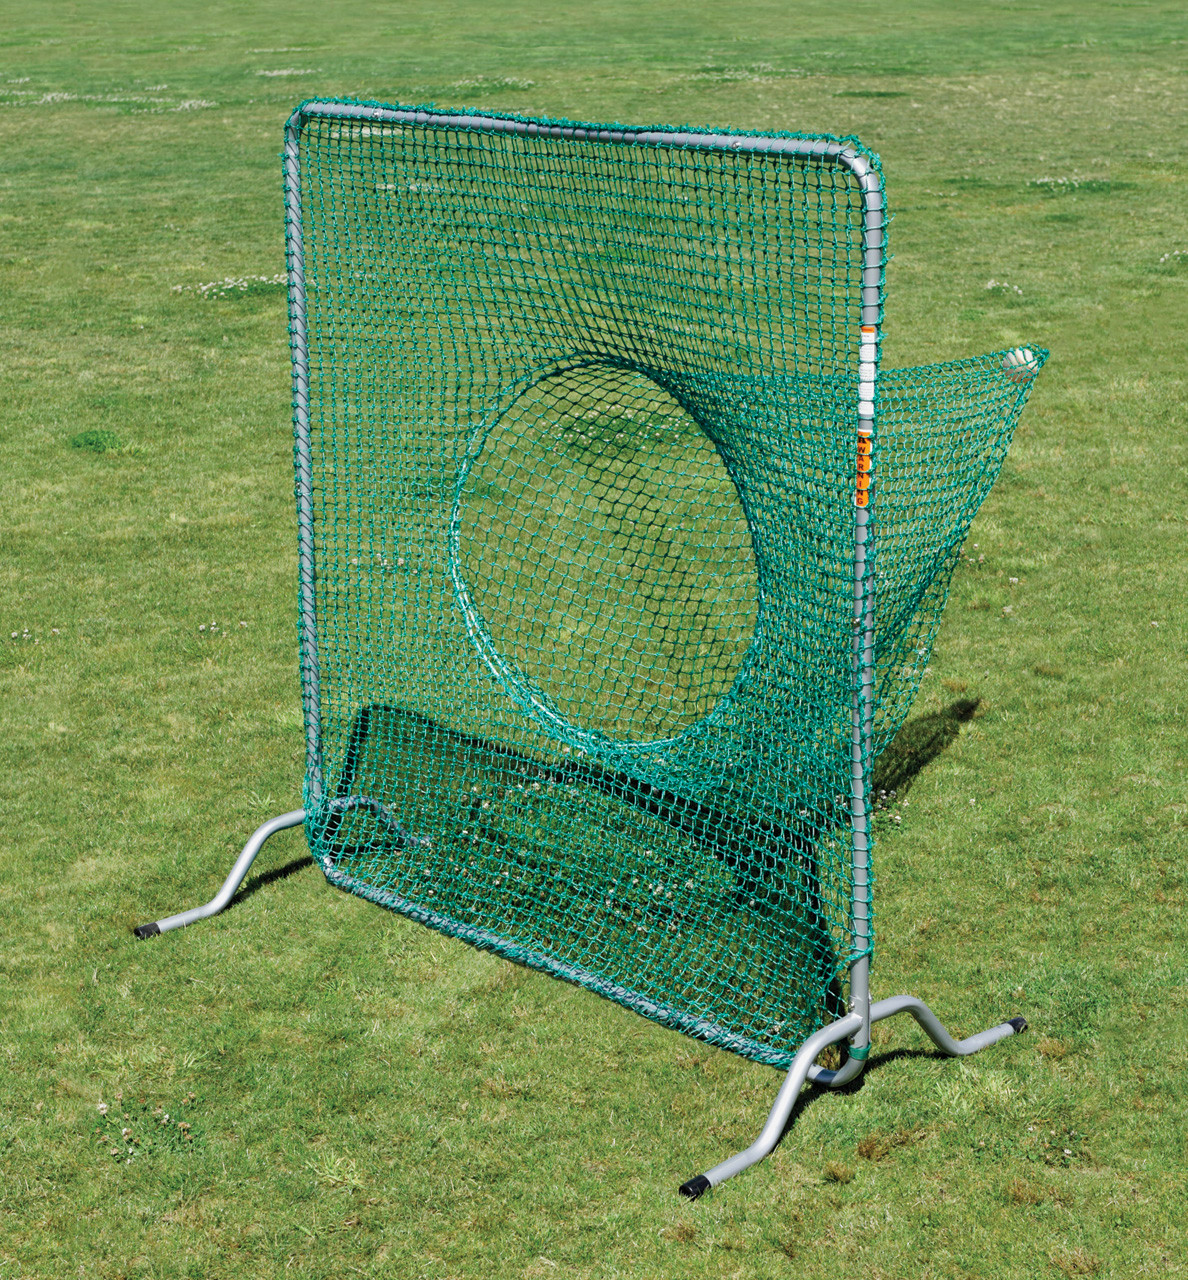 Baseball Softball Target Sock Net Screen Pitching